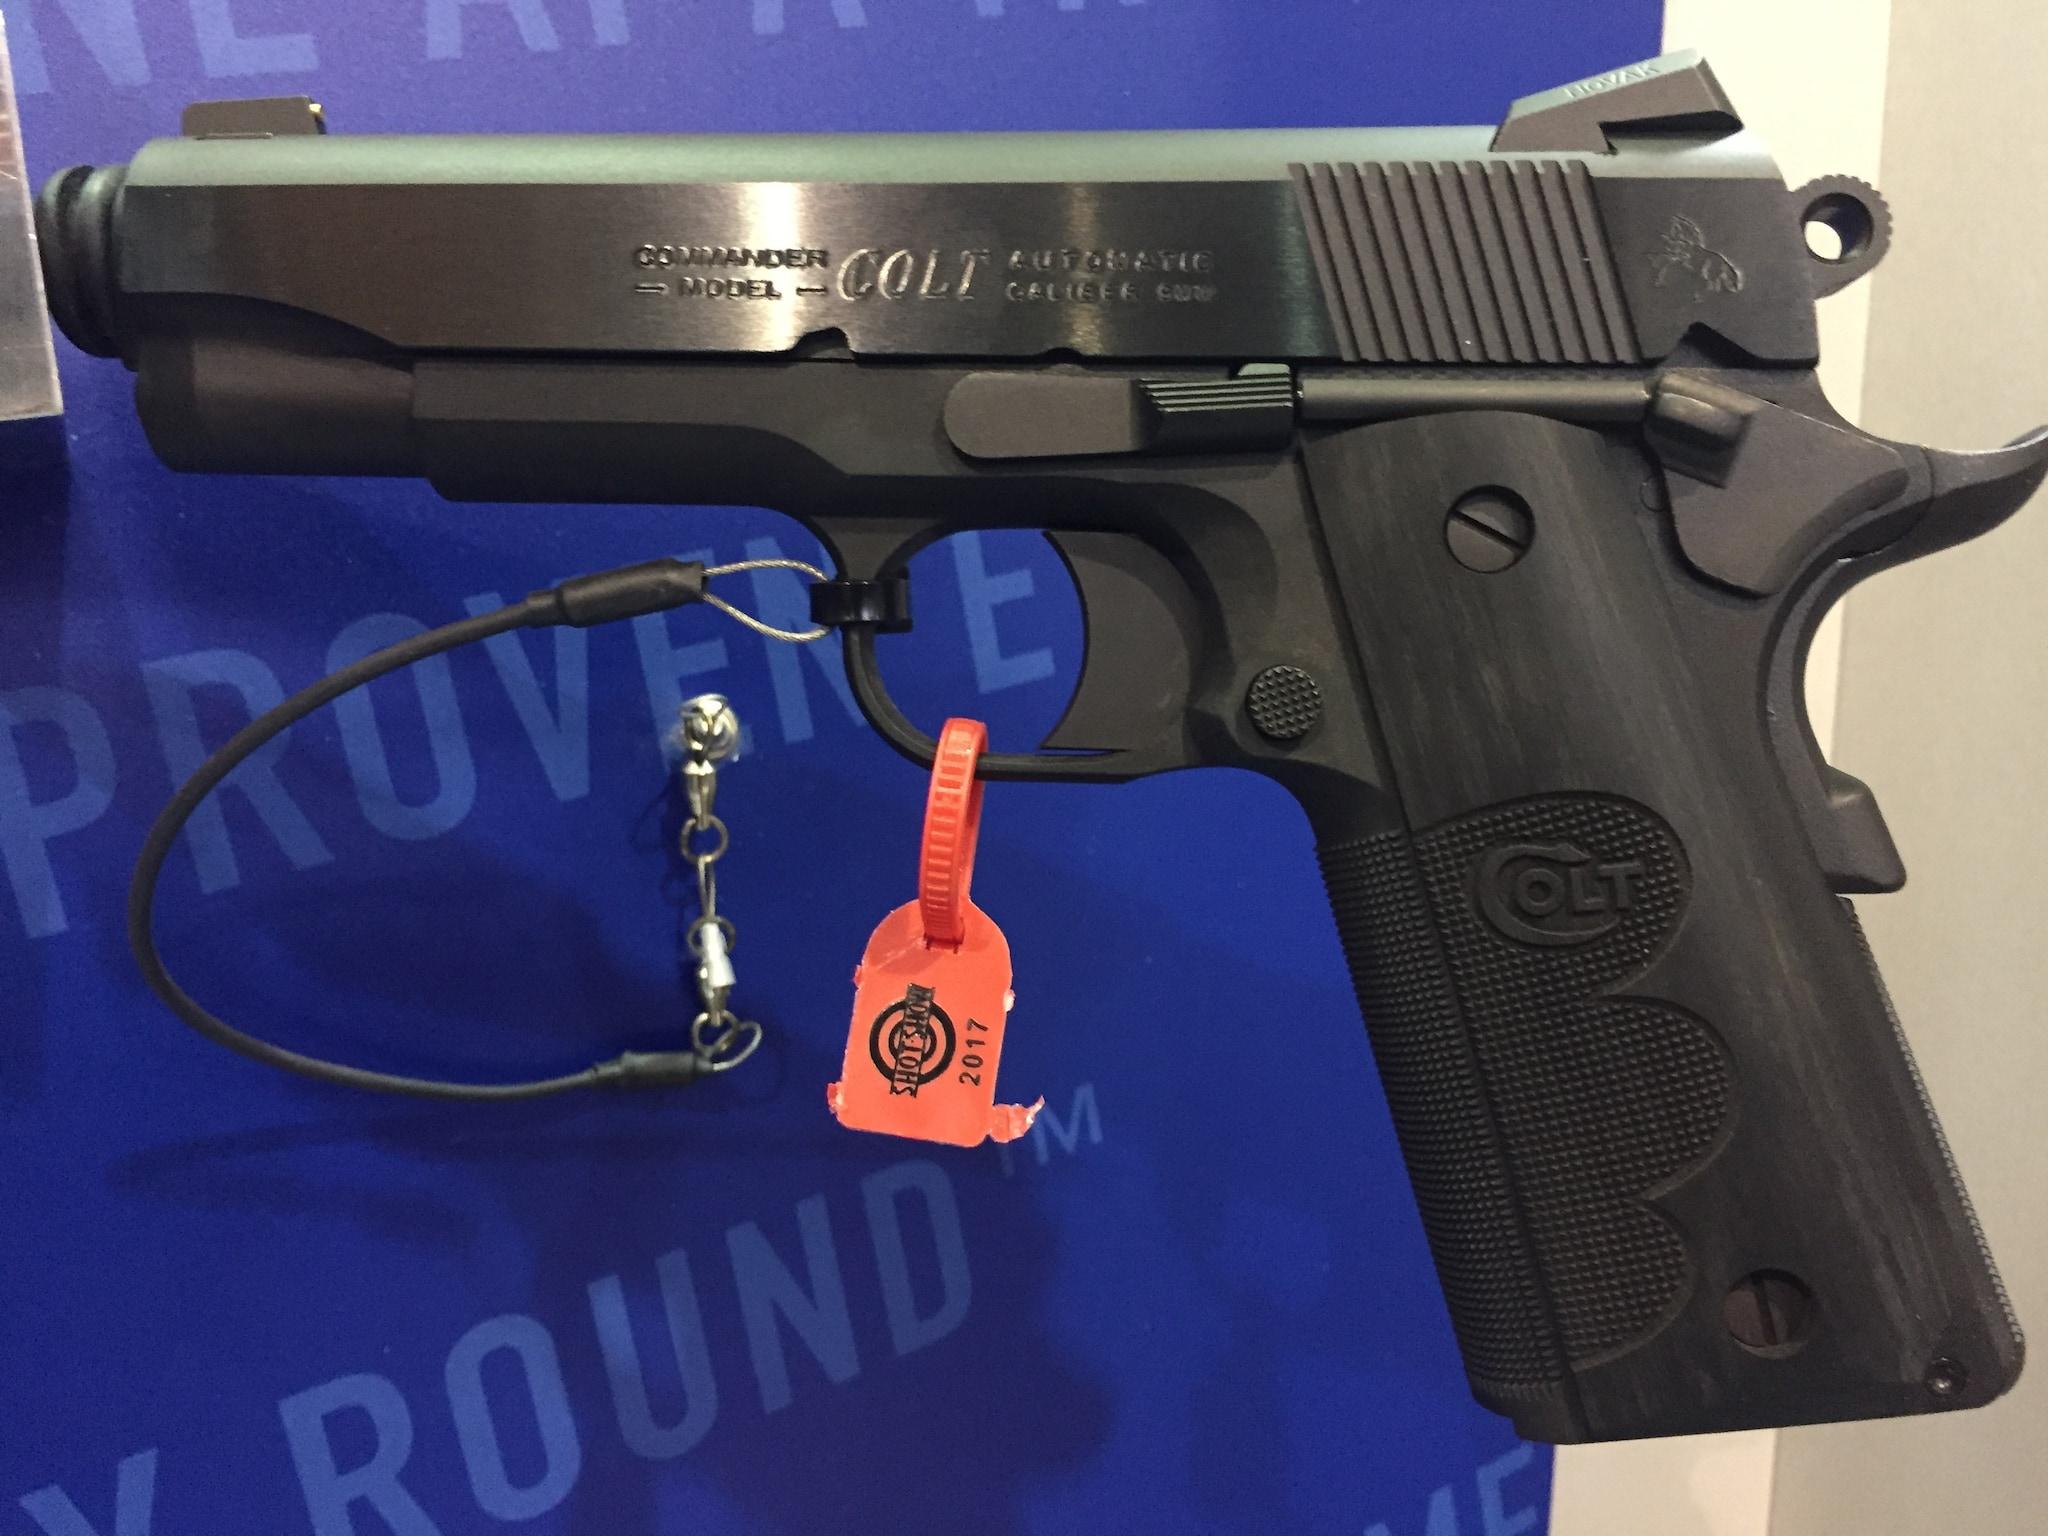 Wiley Clapp 9mm Commander. (Photo: Team HB)